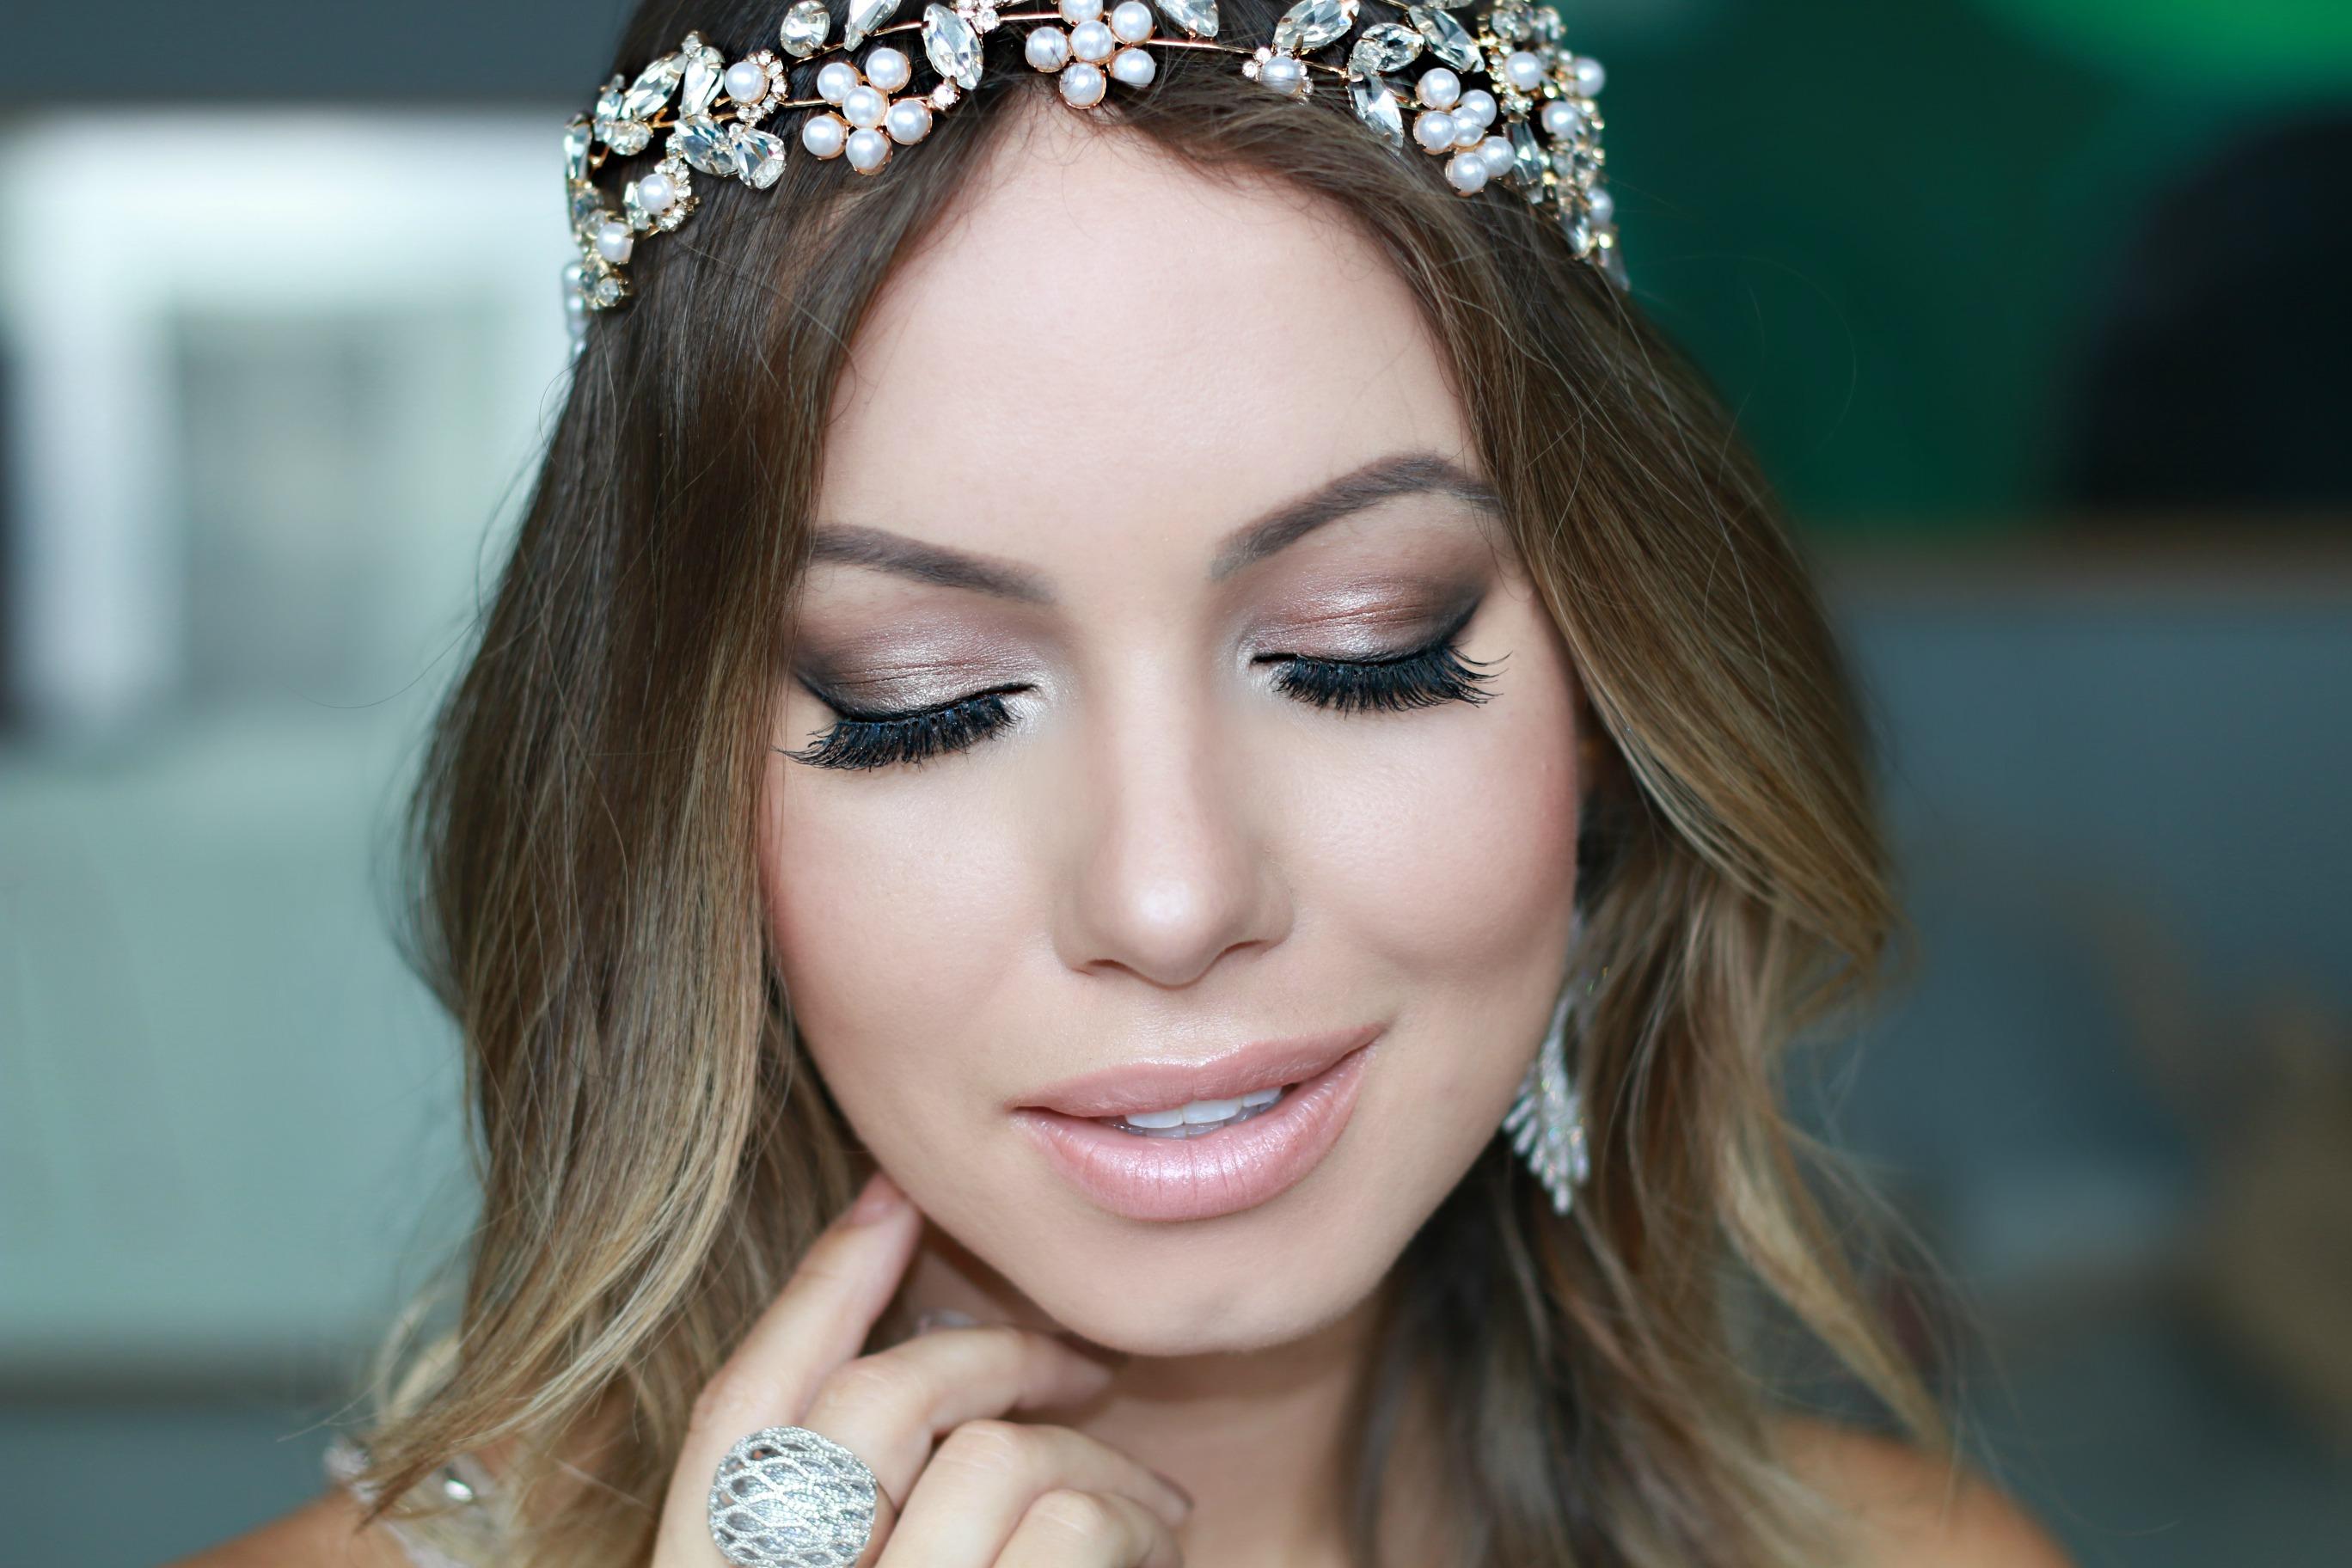 Excepcional maquiagem-miss-casamento-noiva-juliana-goes-4.jpg | Juliana Goes HX21